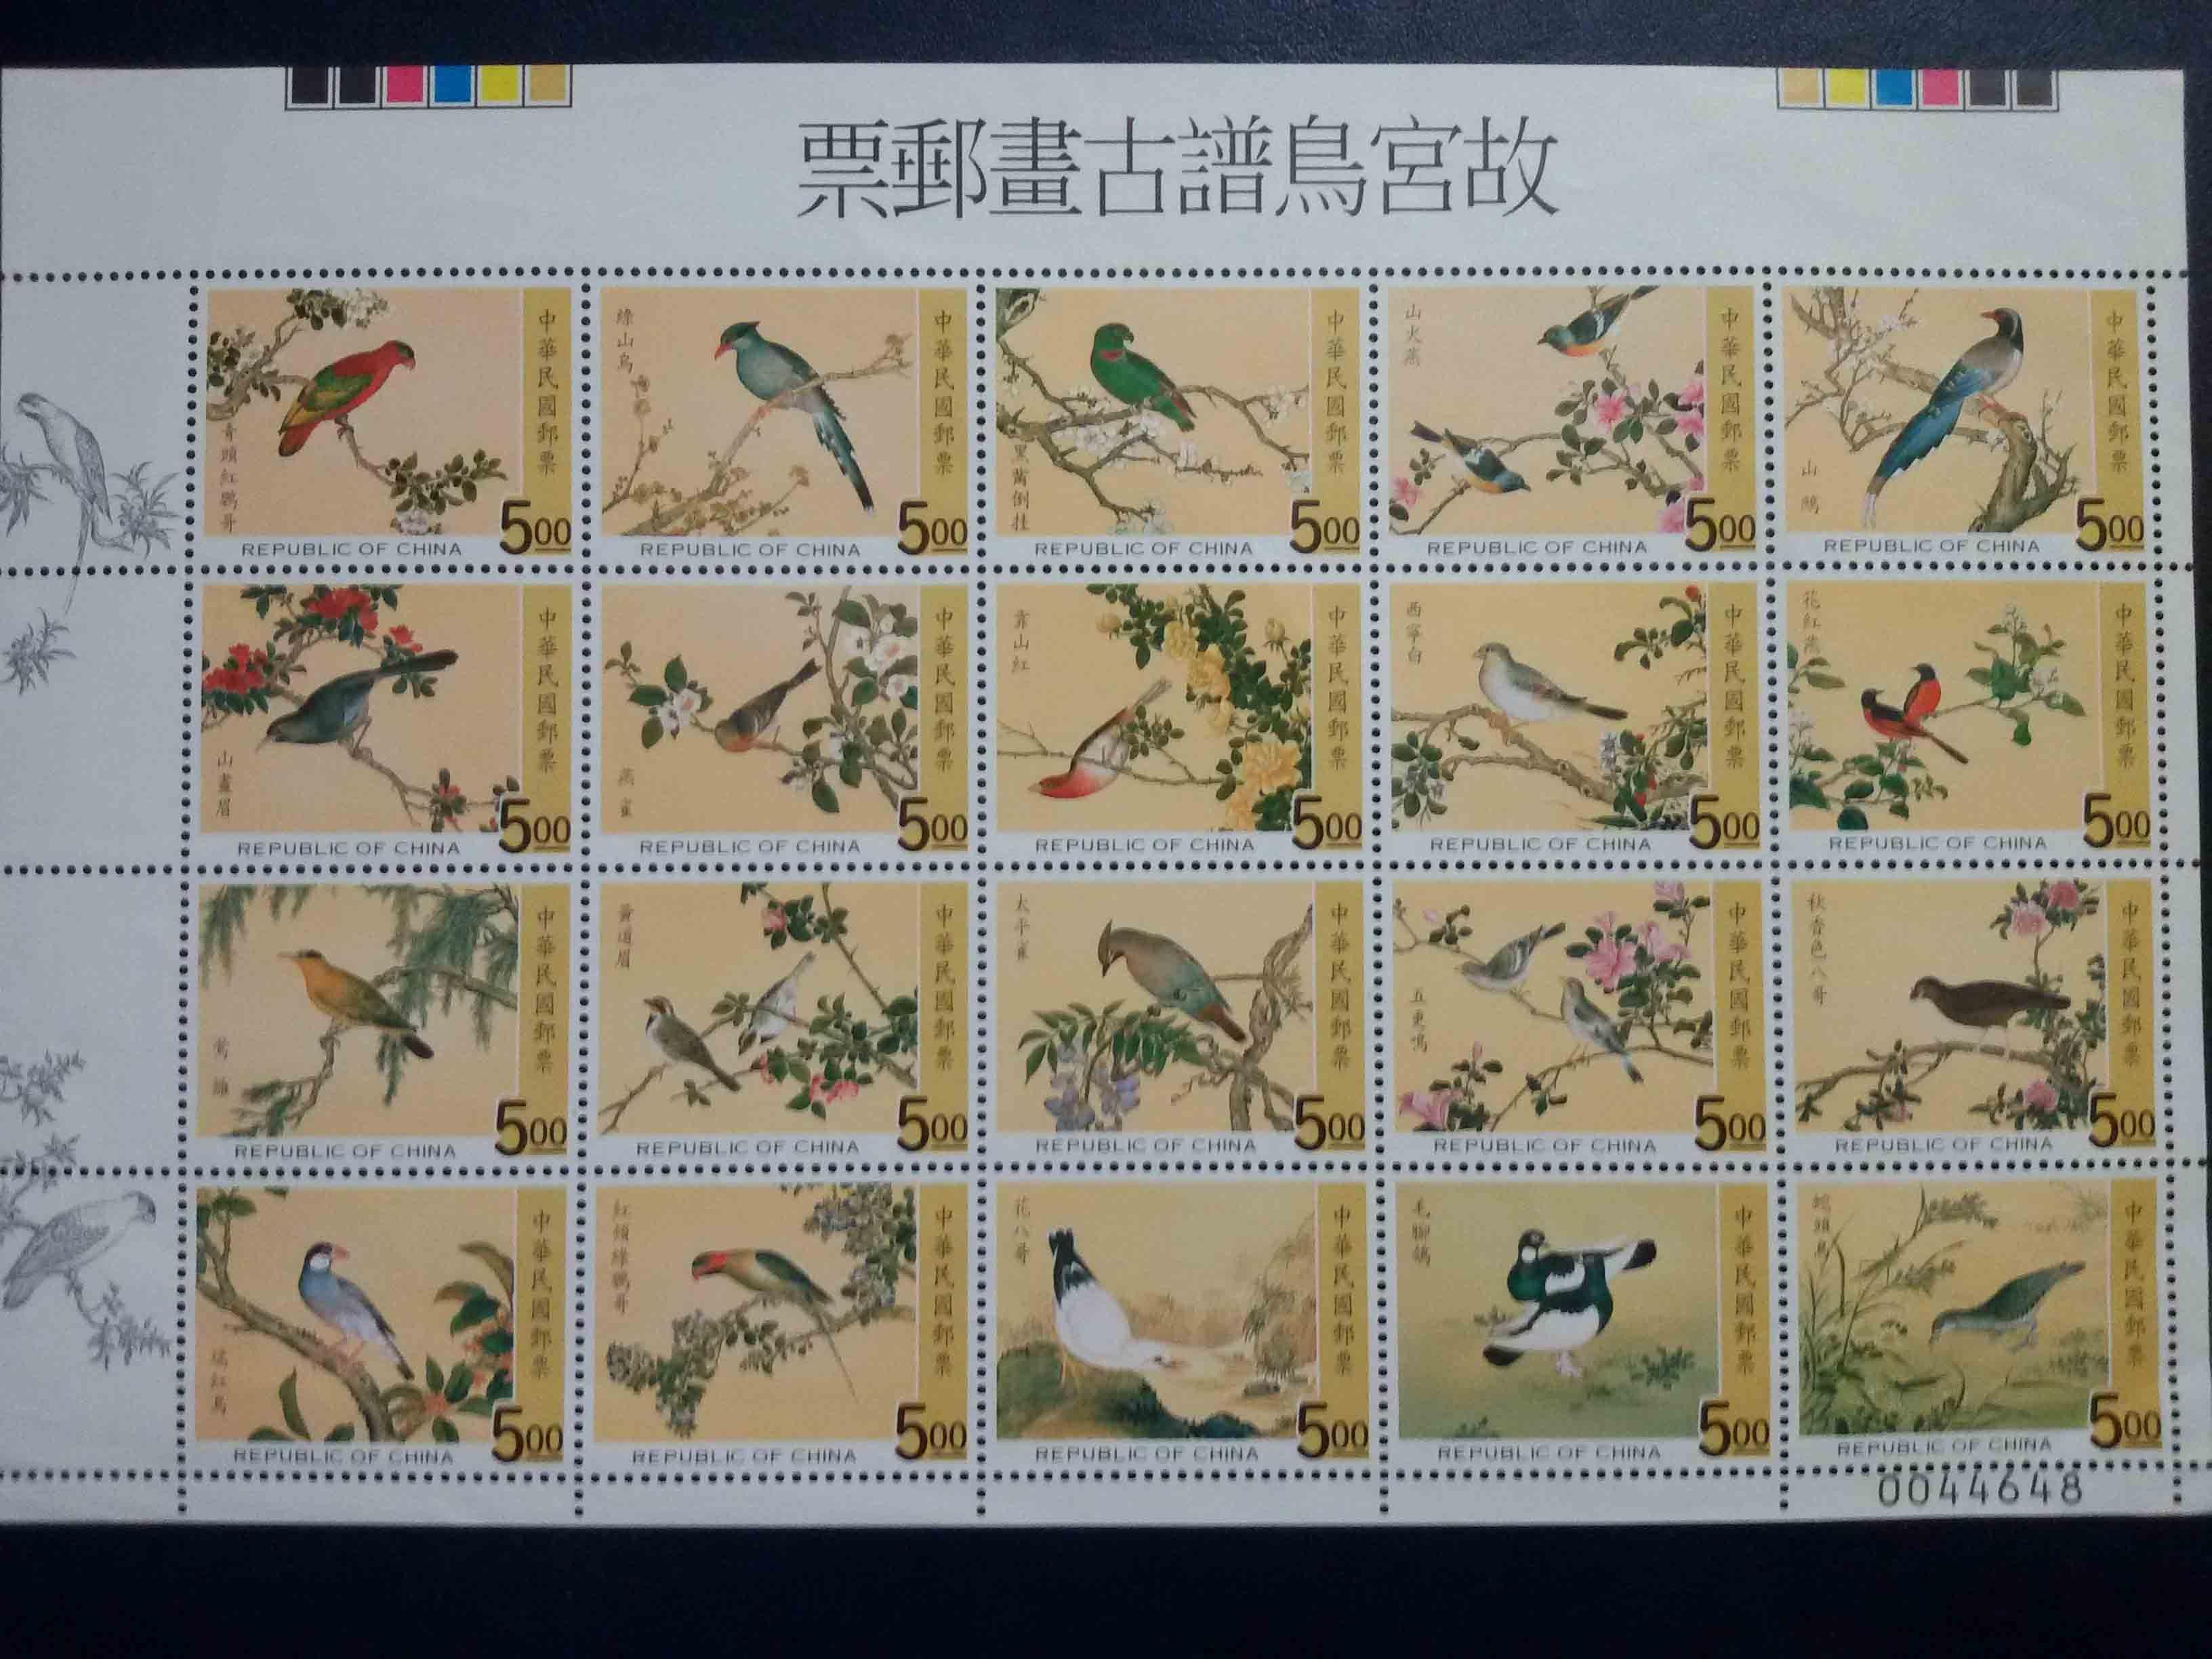 China Miniature Stamp Sheet,China Miniature Stamps, China